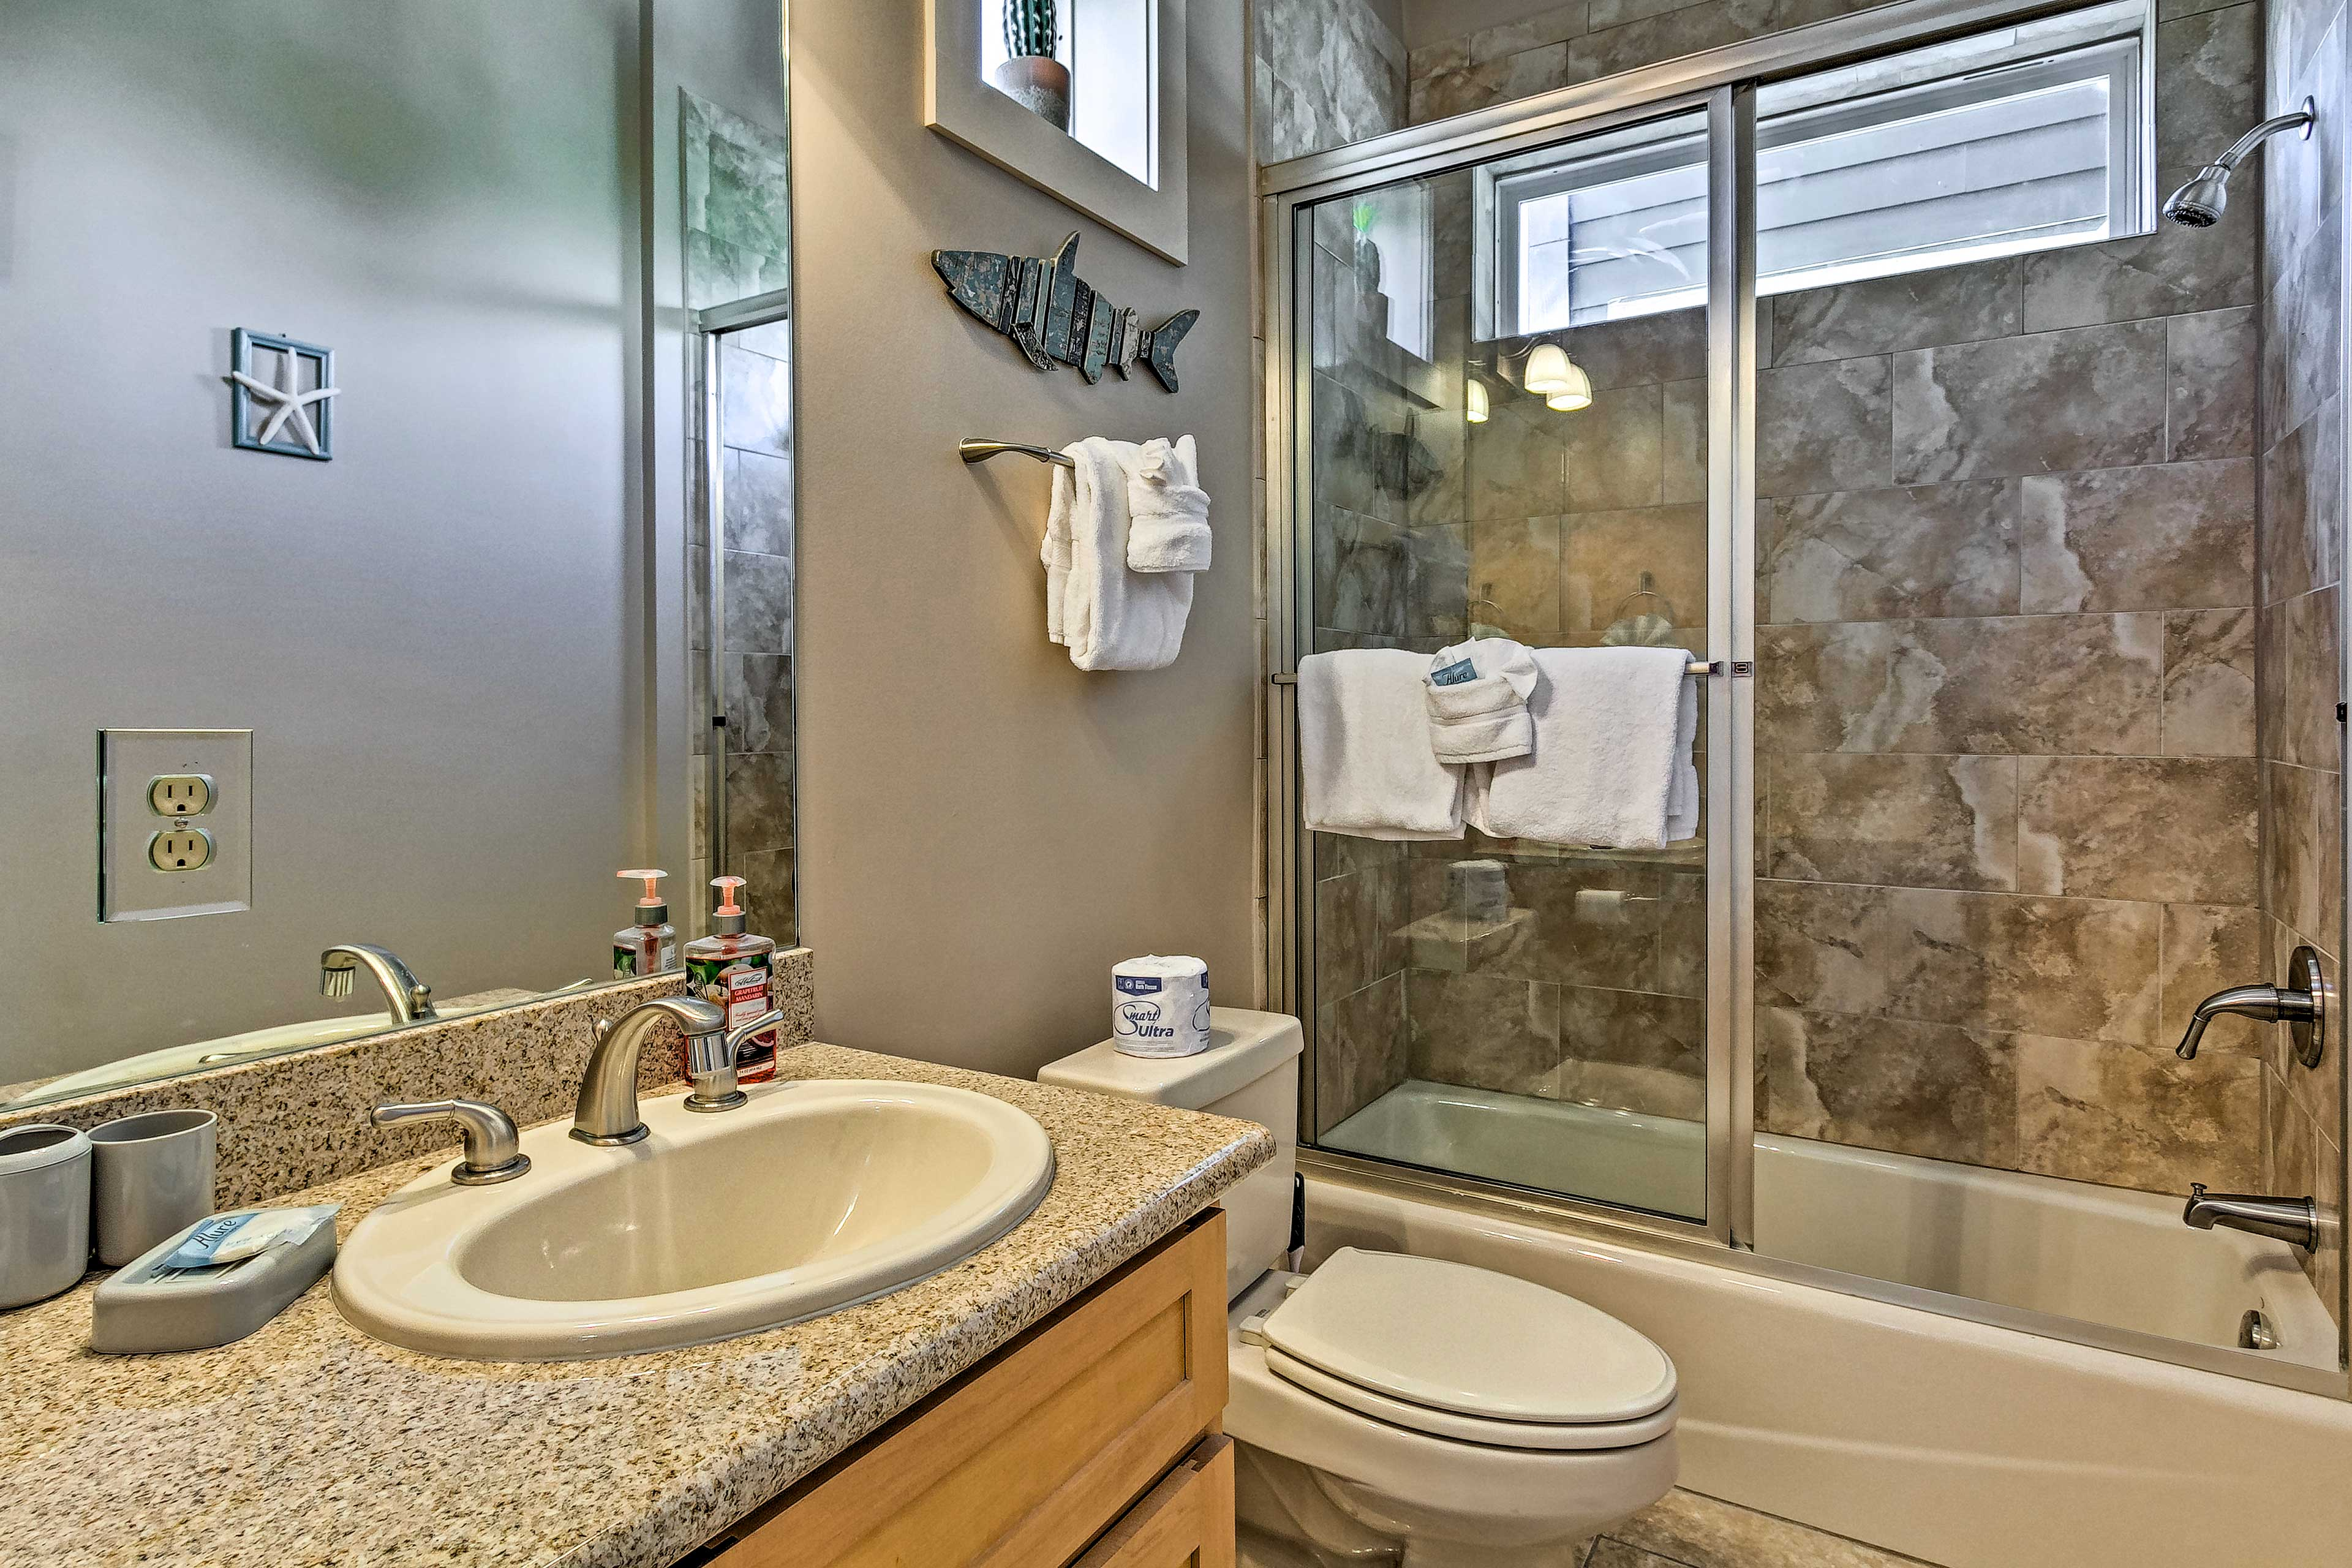 Before calling it a night, rinse off in this full en-suite bathroom.